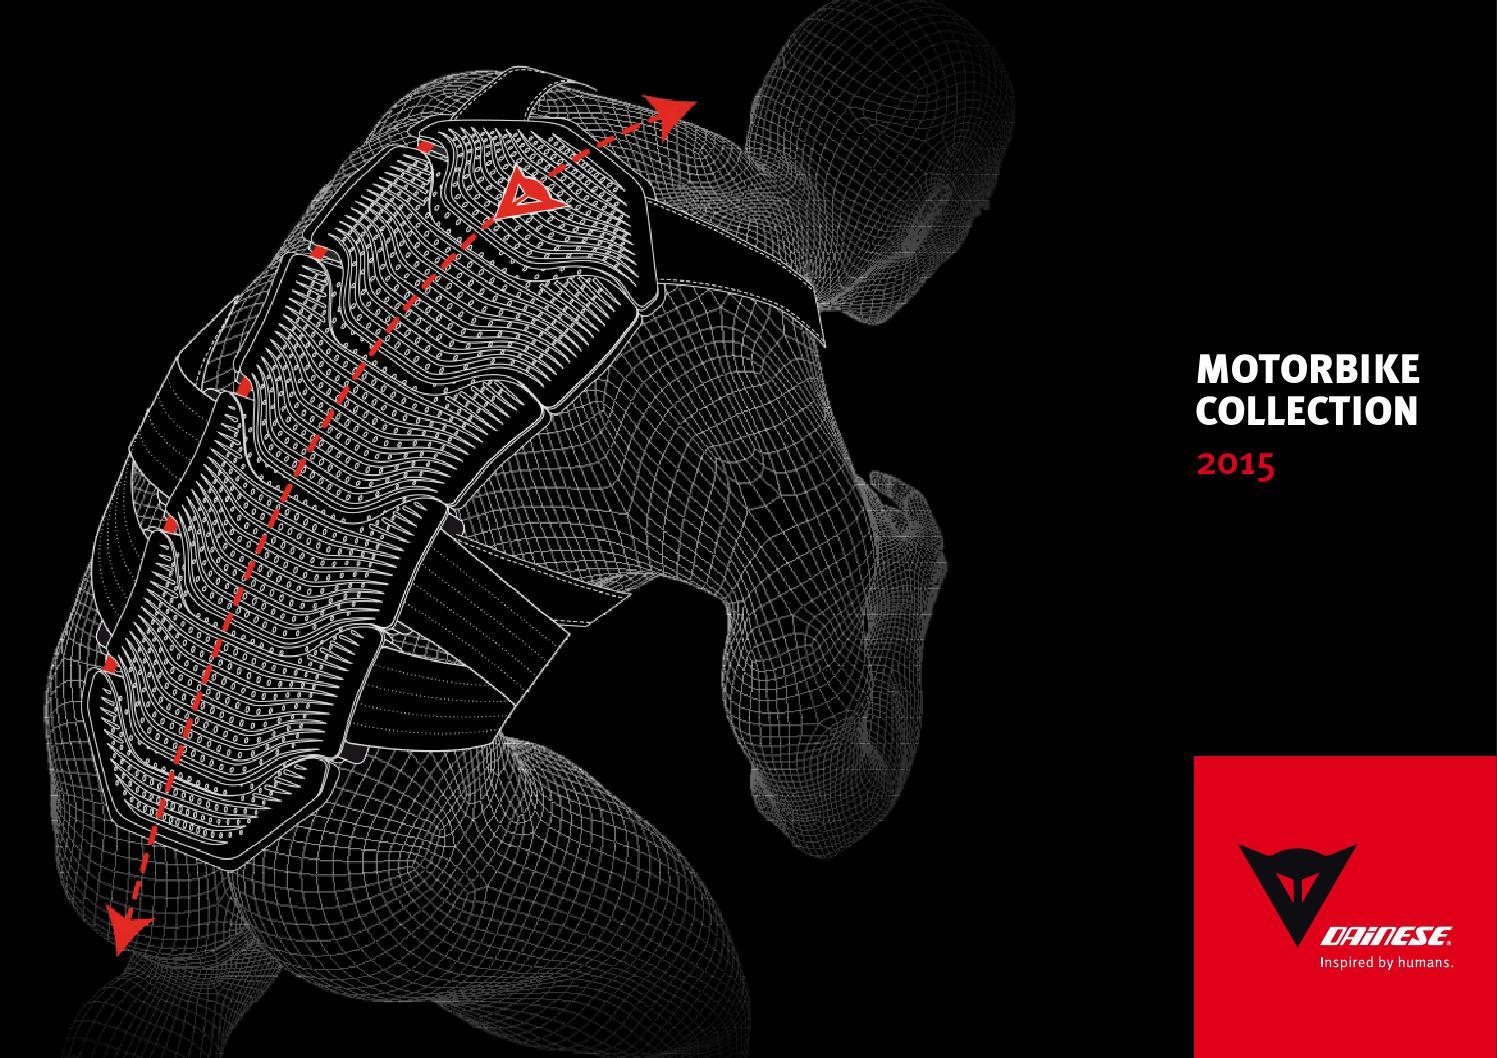 Dainese By 201415 MototainmentDucati Triumph Catalog New Master HWEbeD2Y9I